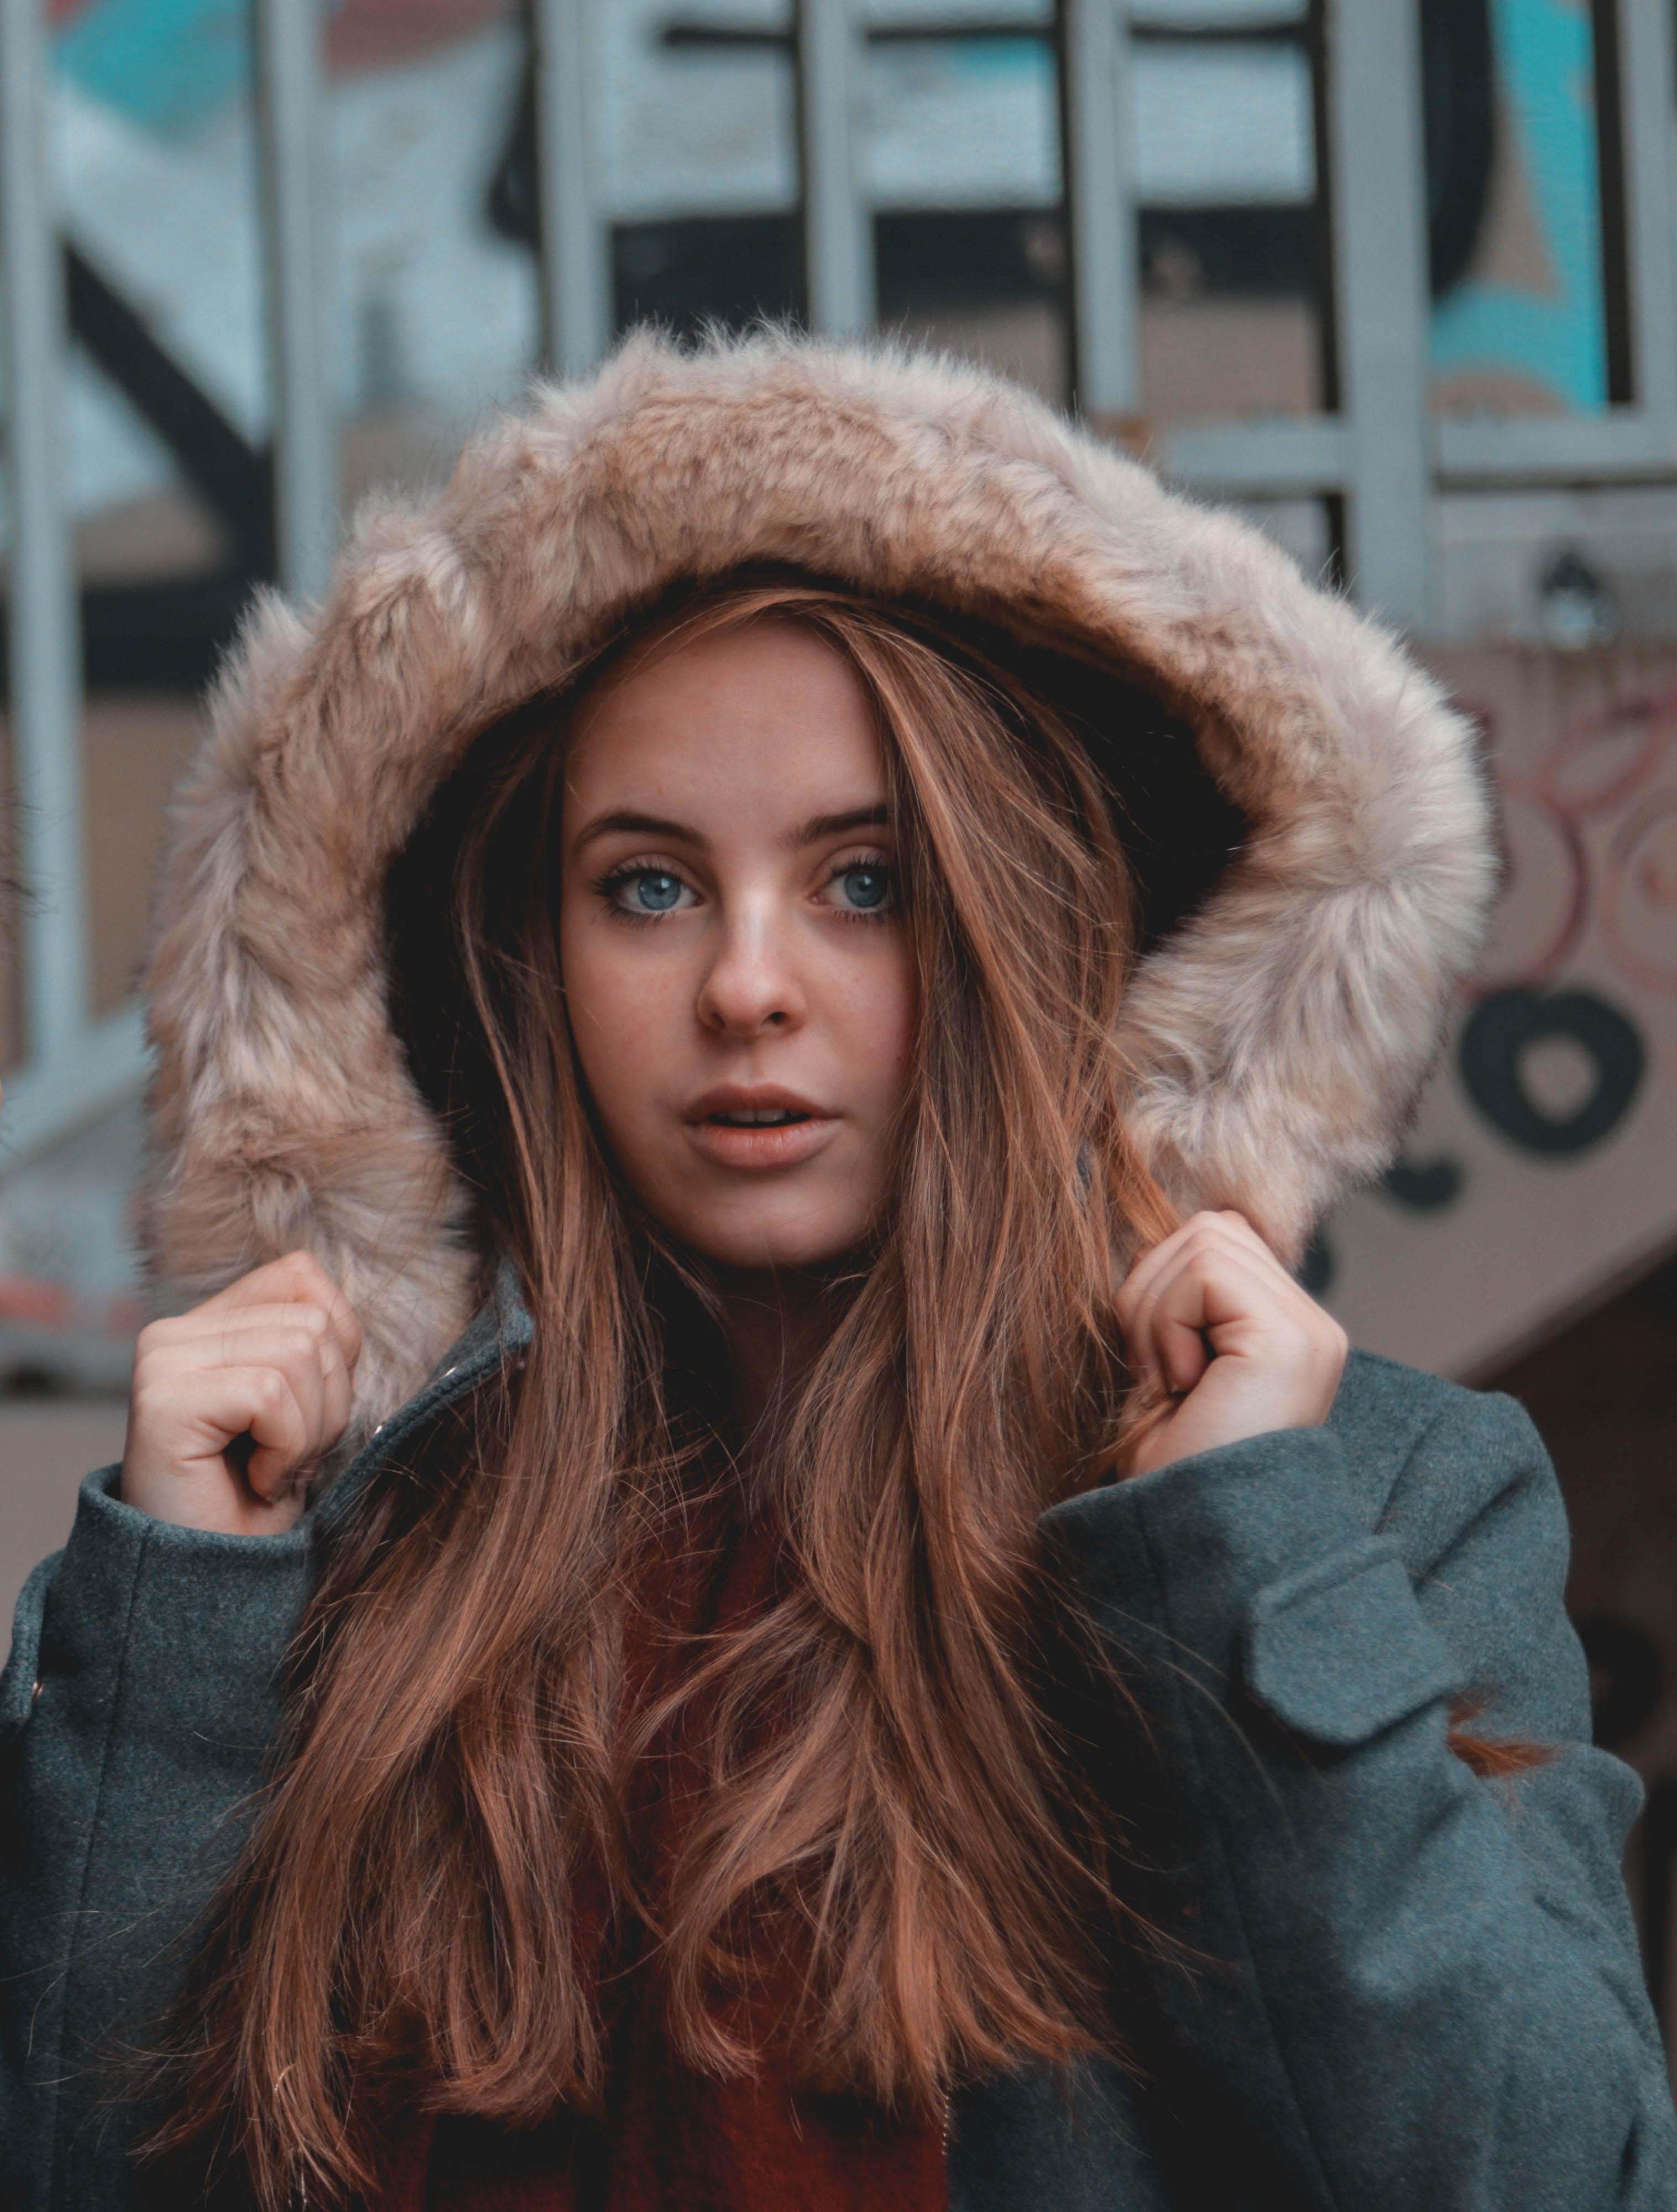 woman wearing gray hooded parka jacket